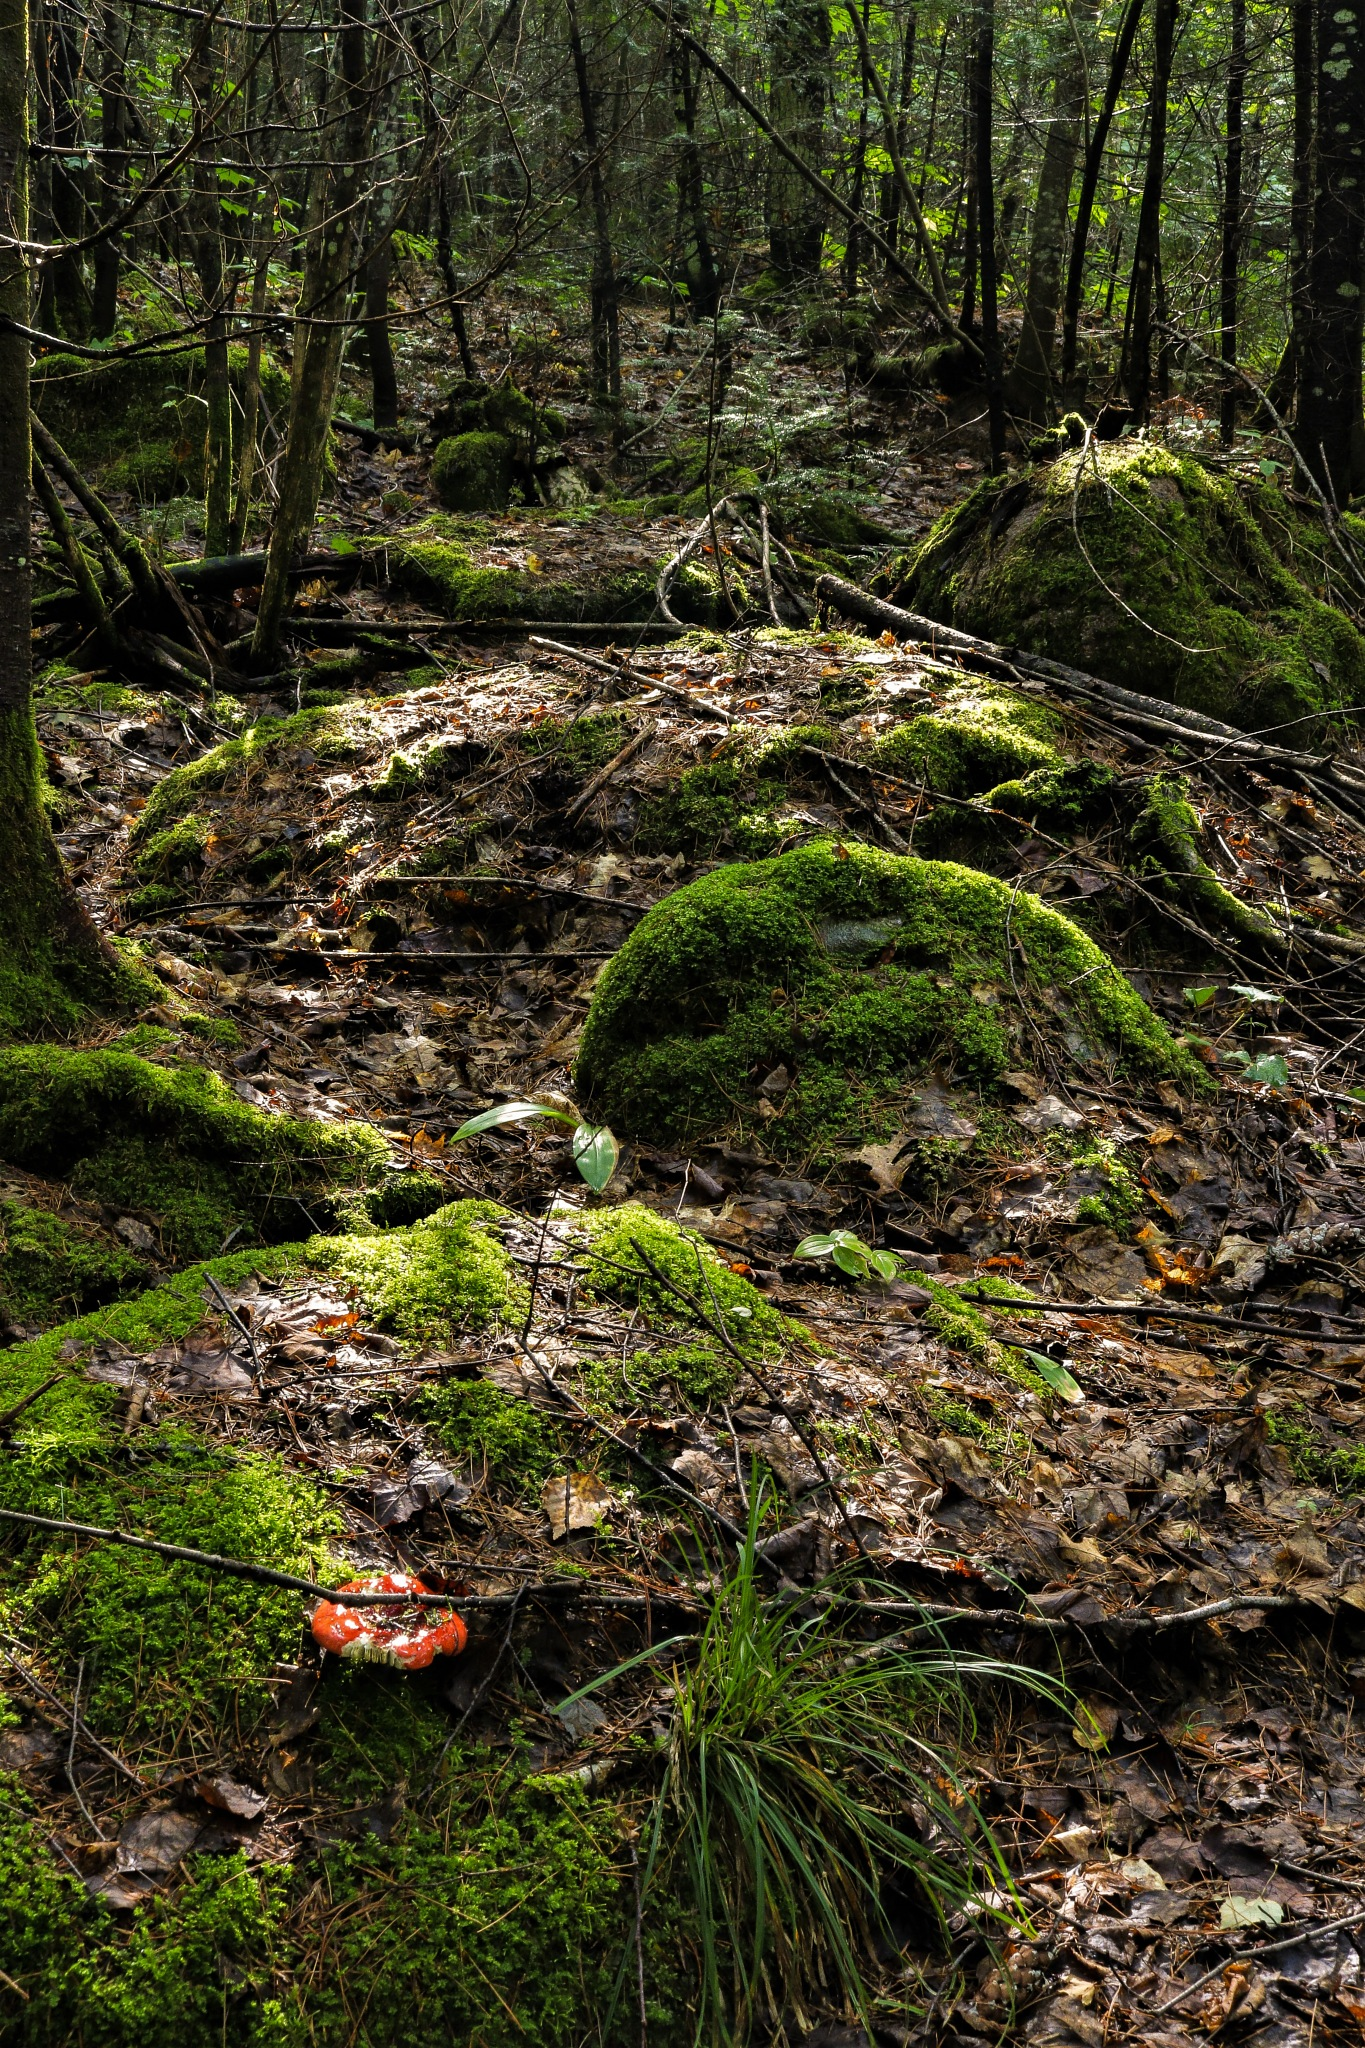 Mossy Rocks  by Eric Fabian